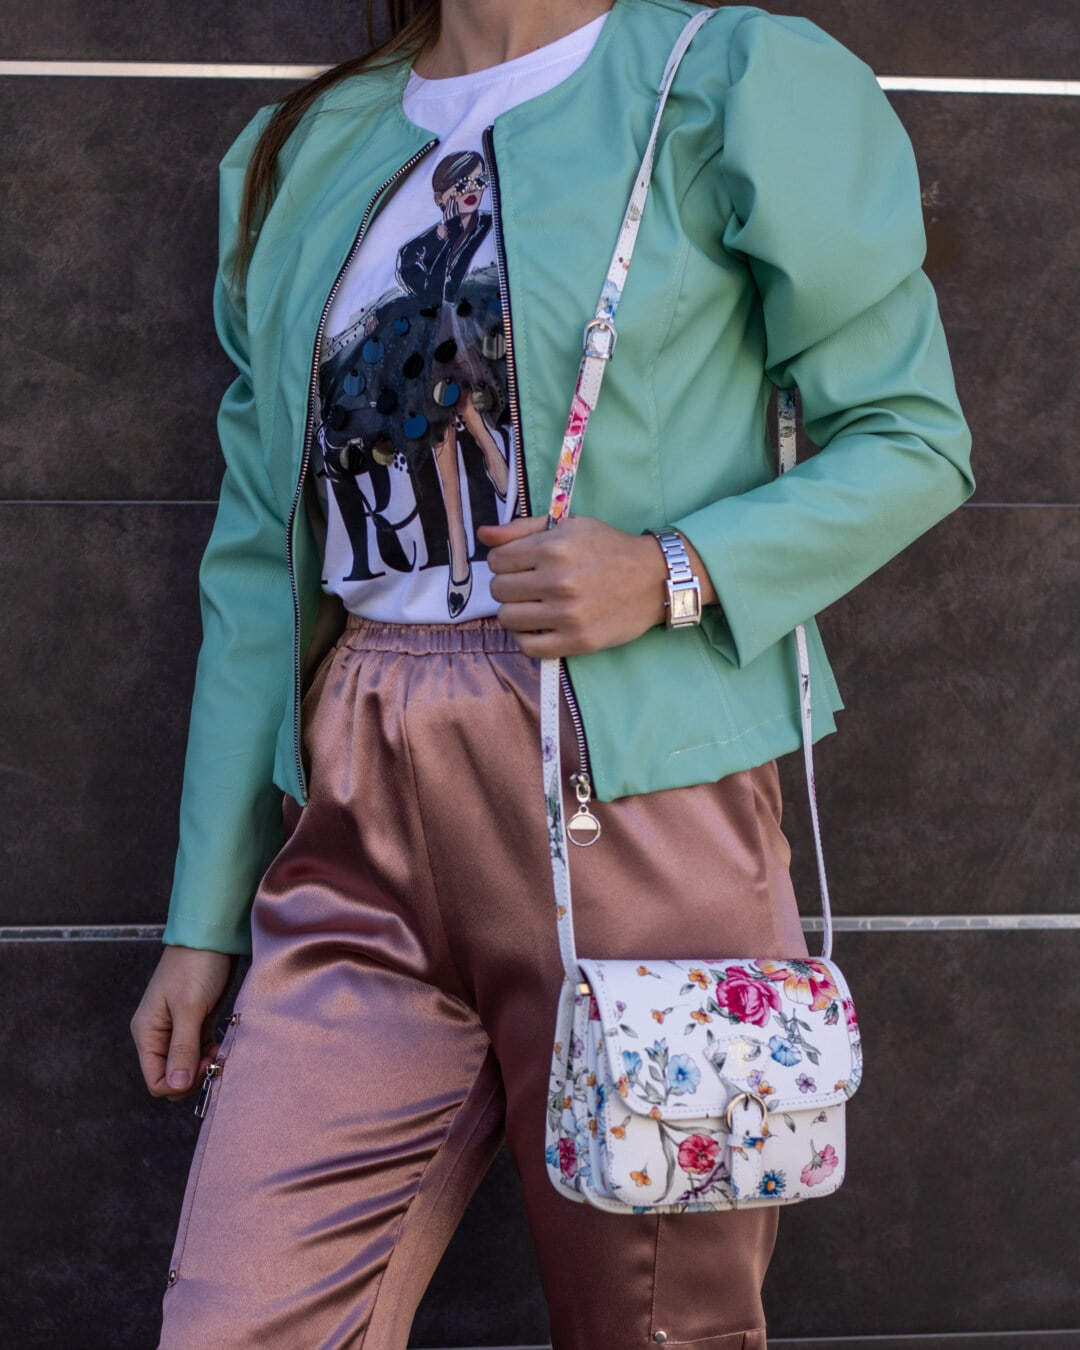 posing, photo model, outfit, jacket, green, fancy, glossy, pants, handbag, girl